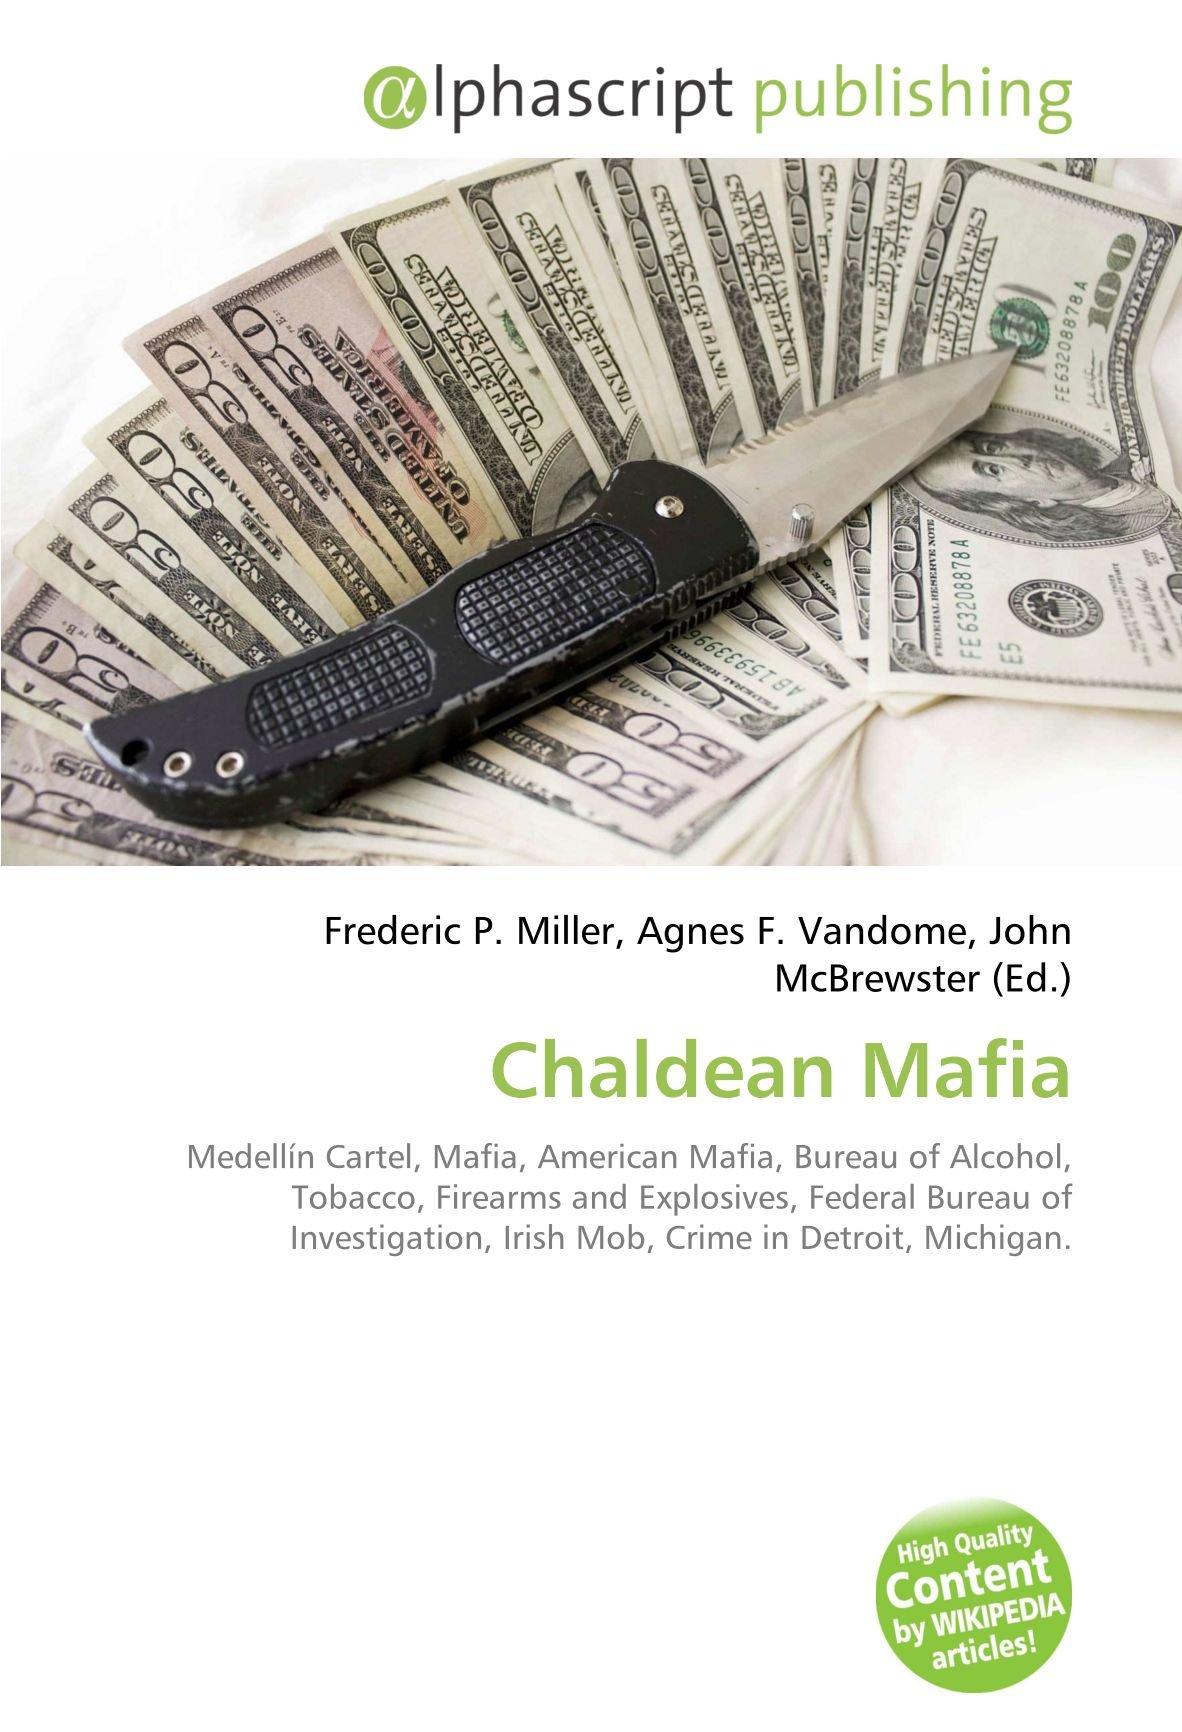 Chaldean Mafia: Medellín Cartel, Mafia, American Mafia, Bureau of Alcohol, Tobacco, Firearms and Explosives, Federal Bureau of Investigation, Irish Mob, ...